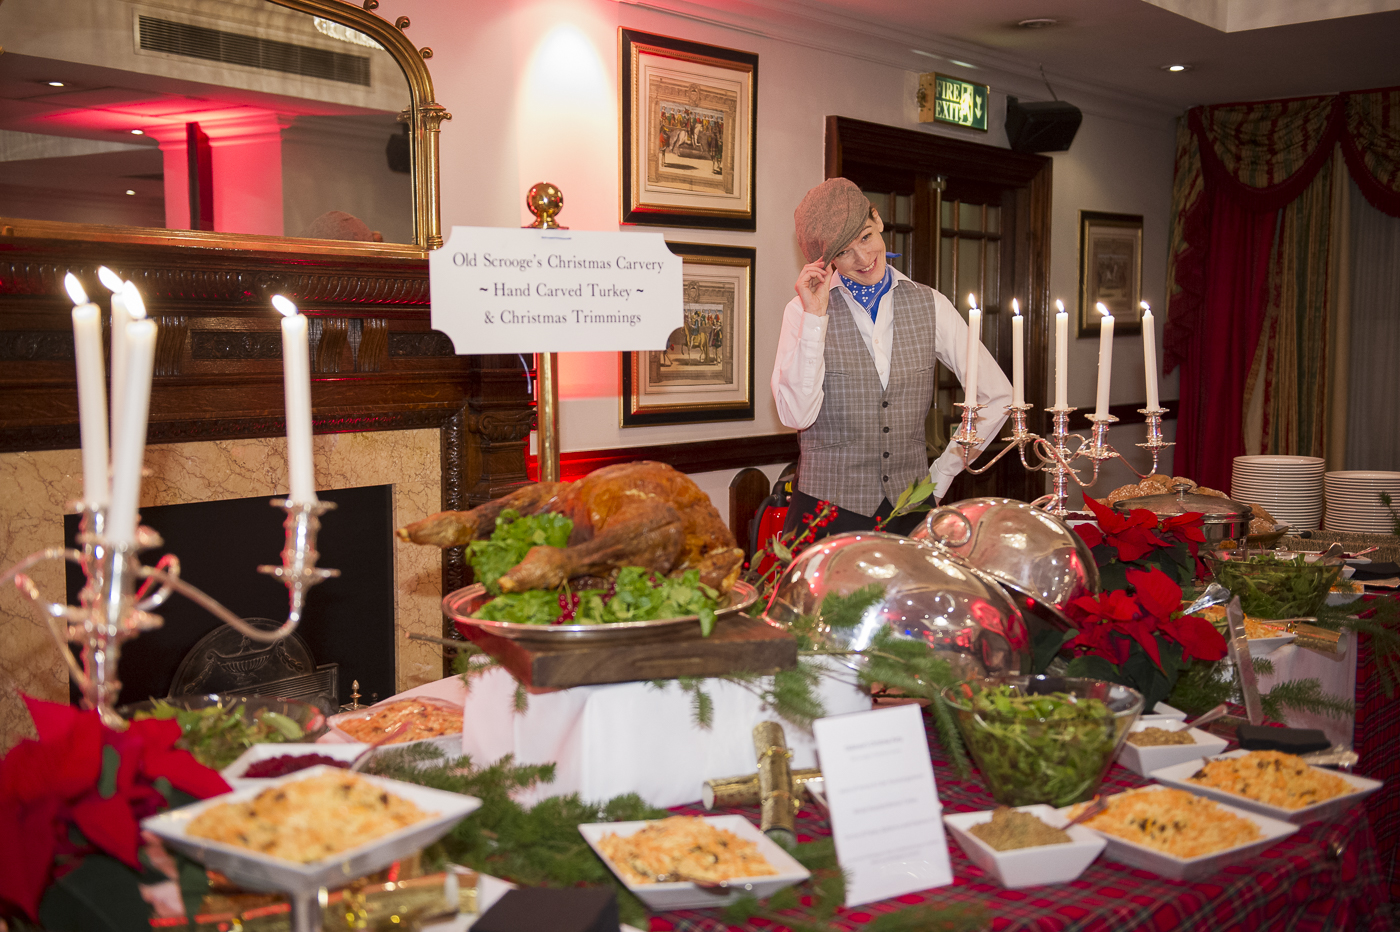 Dickensian buffet, festive party